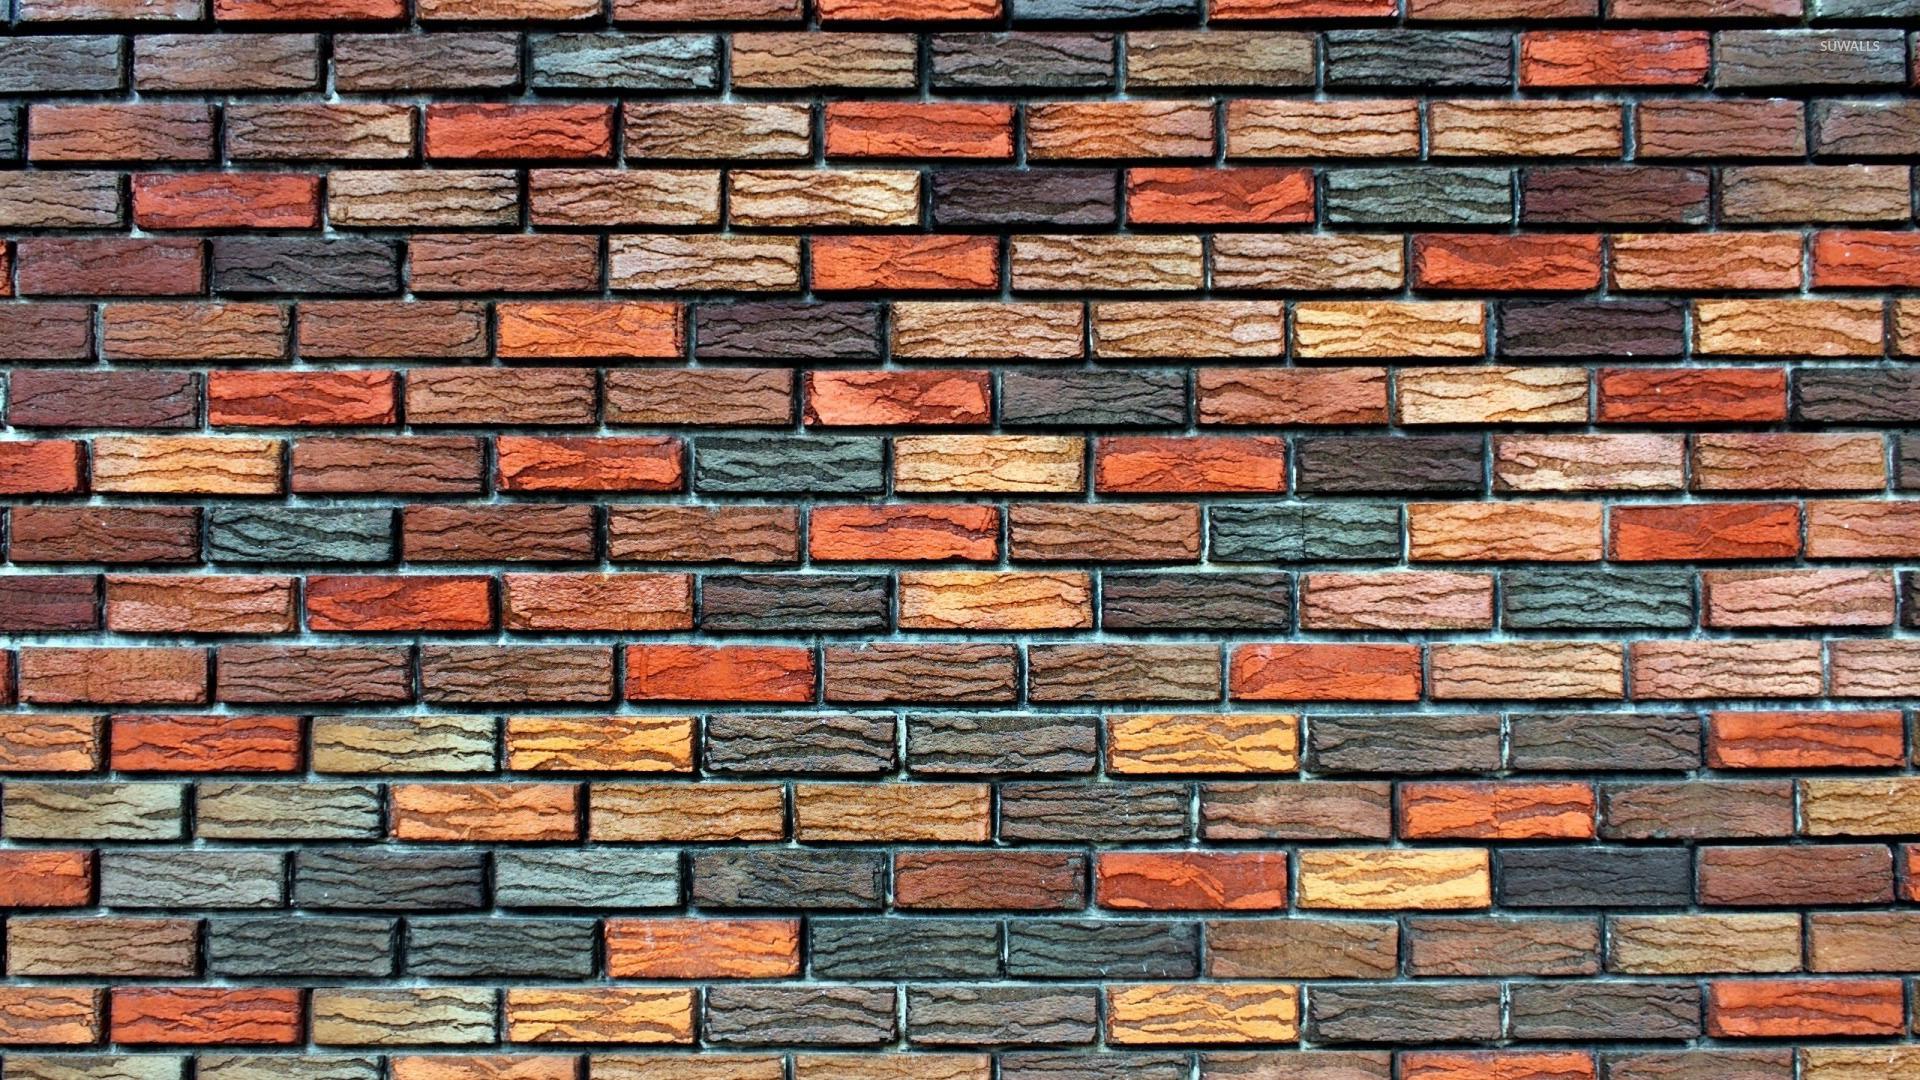 Brick wall wallpaper - Photography wallpapers - #22360